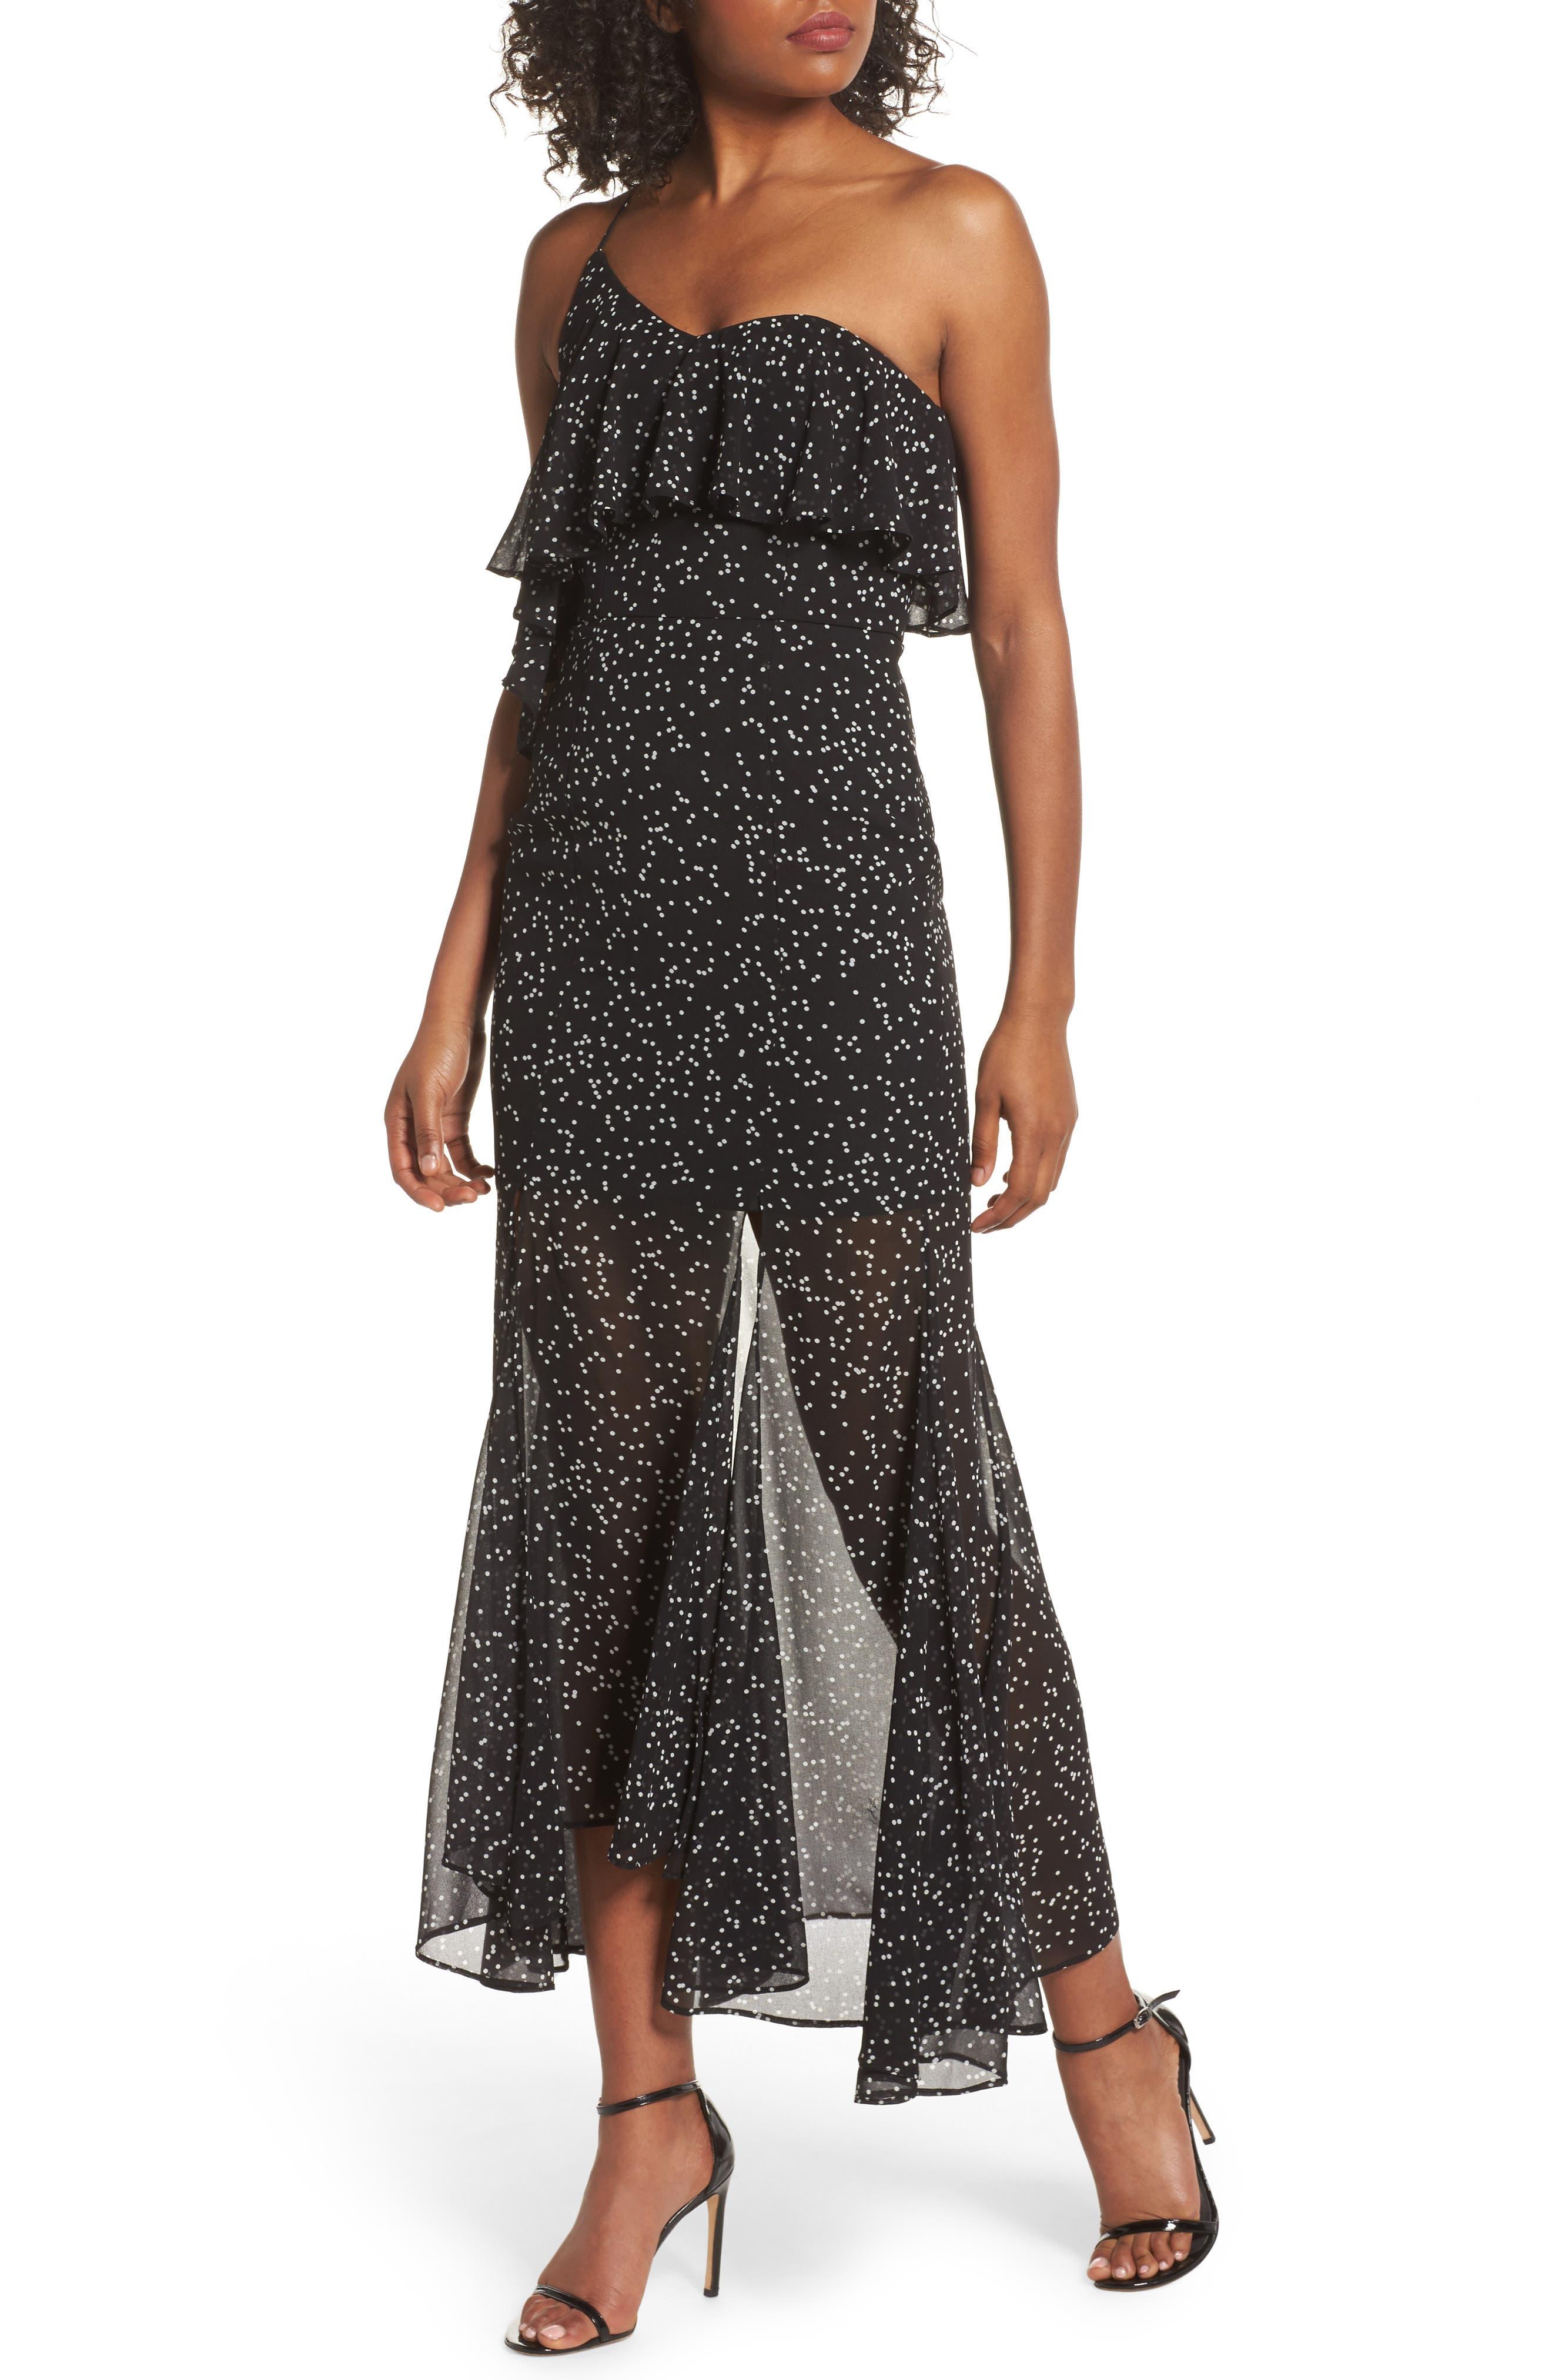 Embrace One Shoulder Dress,                             Main thumbnail 1, color,                             Black W White Spot